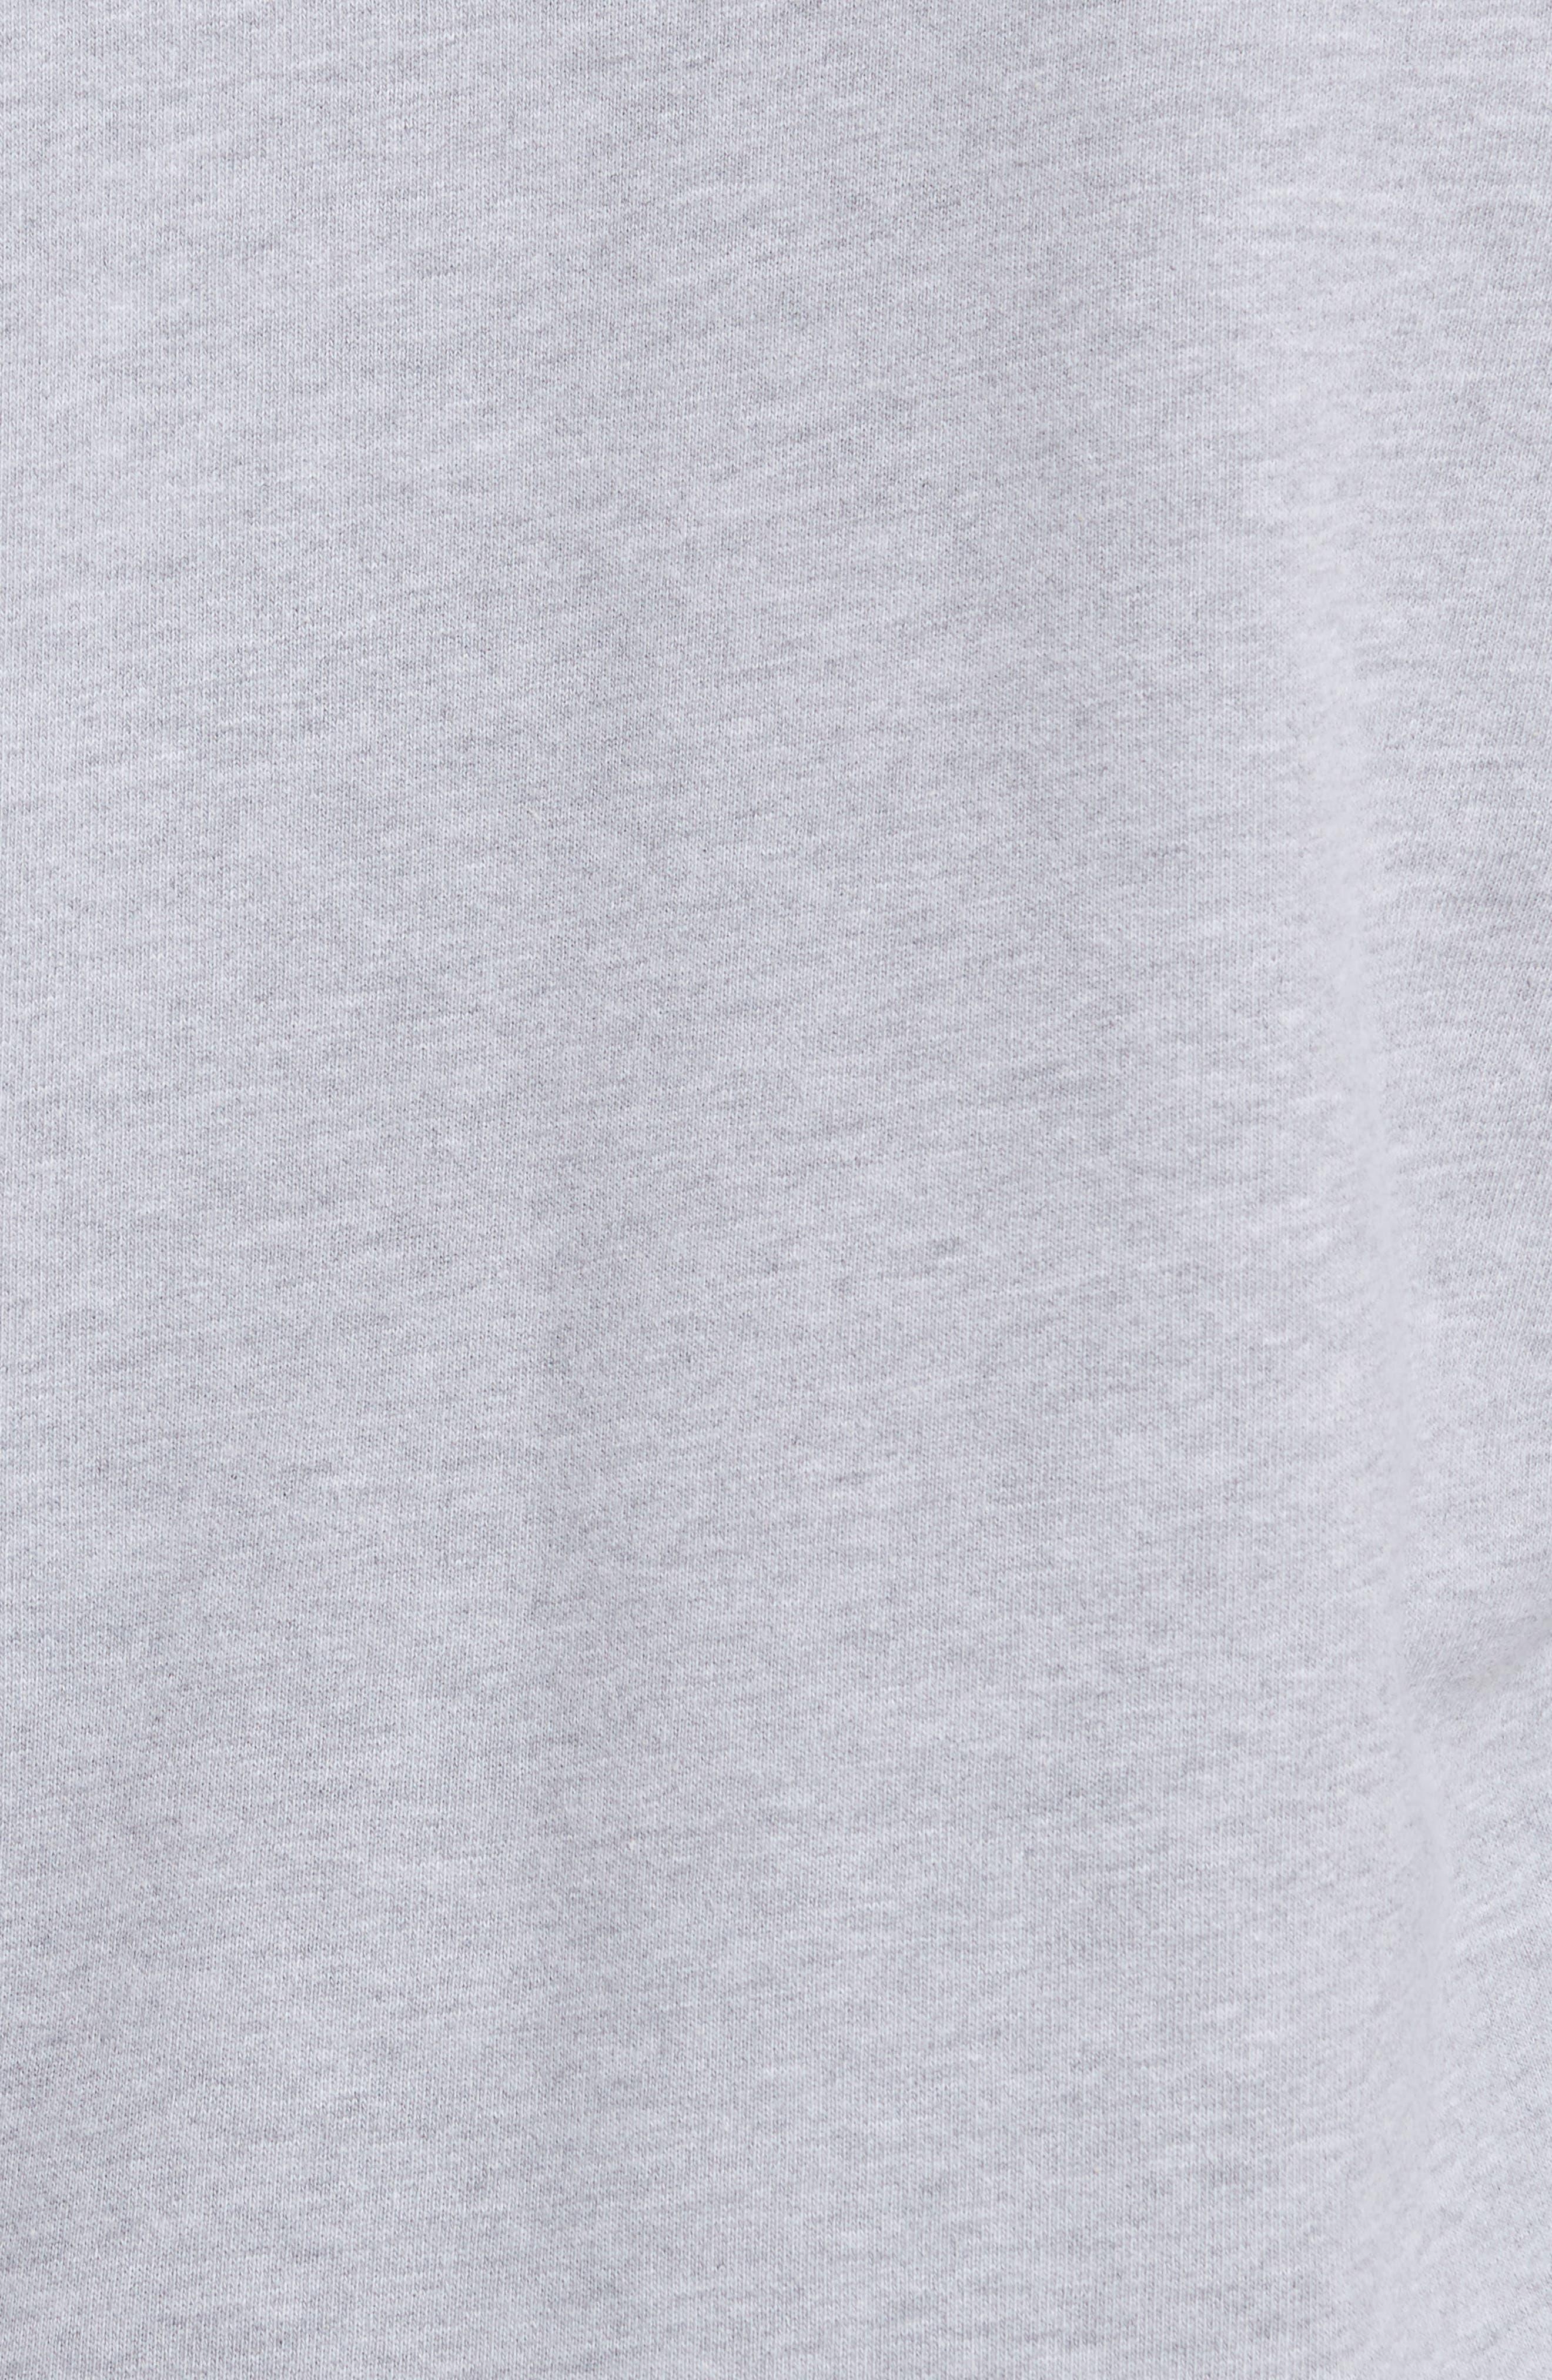 Jennings Embroidered Sweatshirt,                             Alternate thumbnail 5, color,                             021